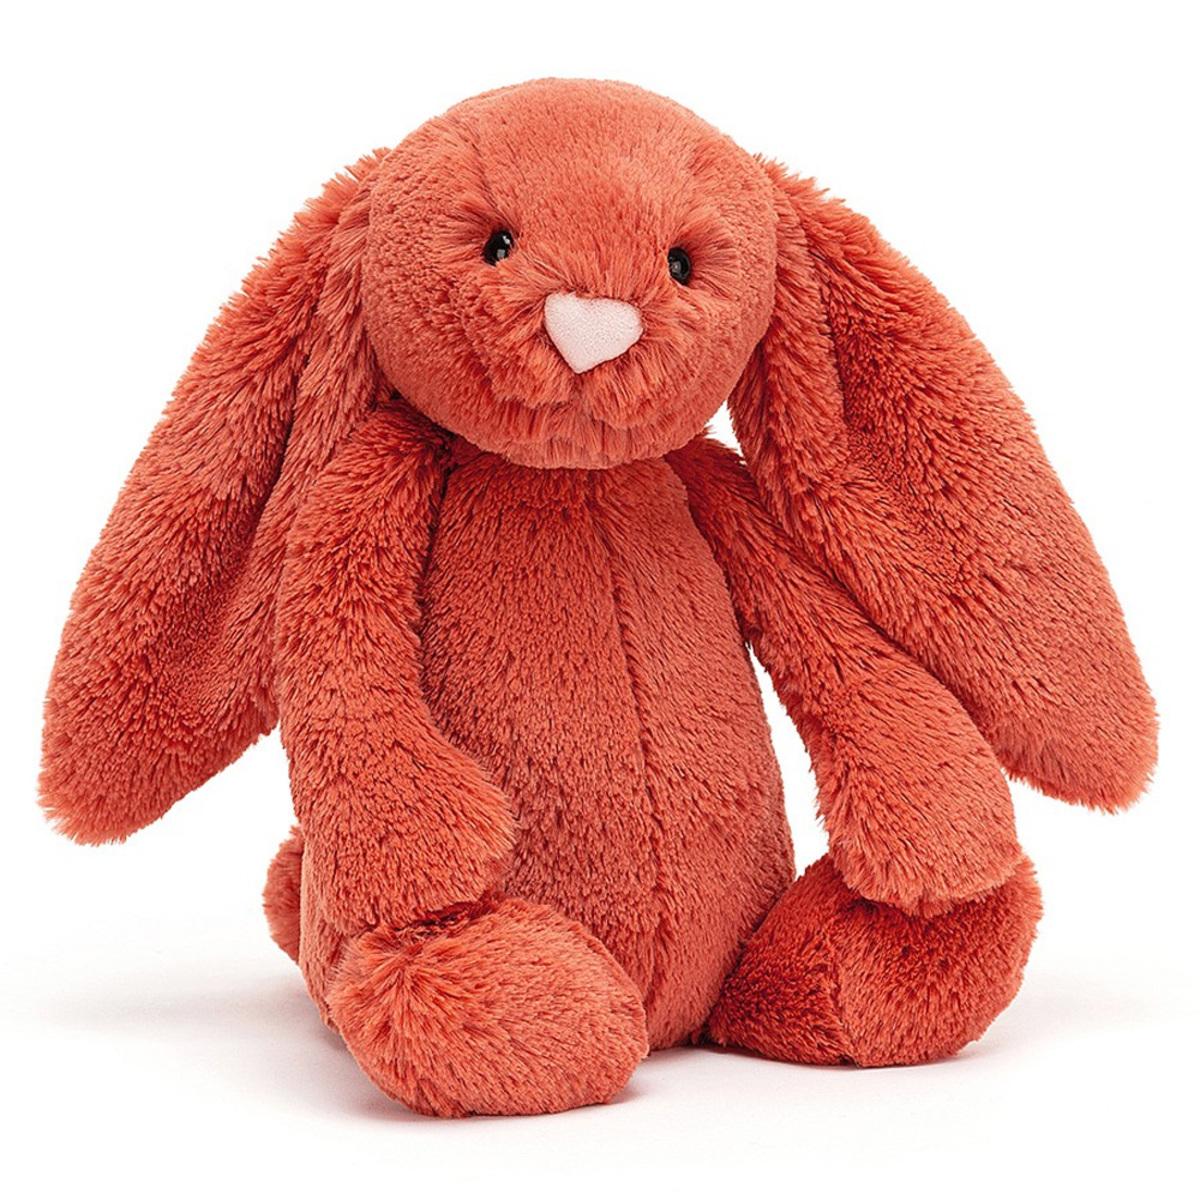 Peluche Bashful Cinnamon Bunny - Medium Peluche Lapin 31 cm